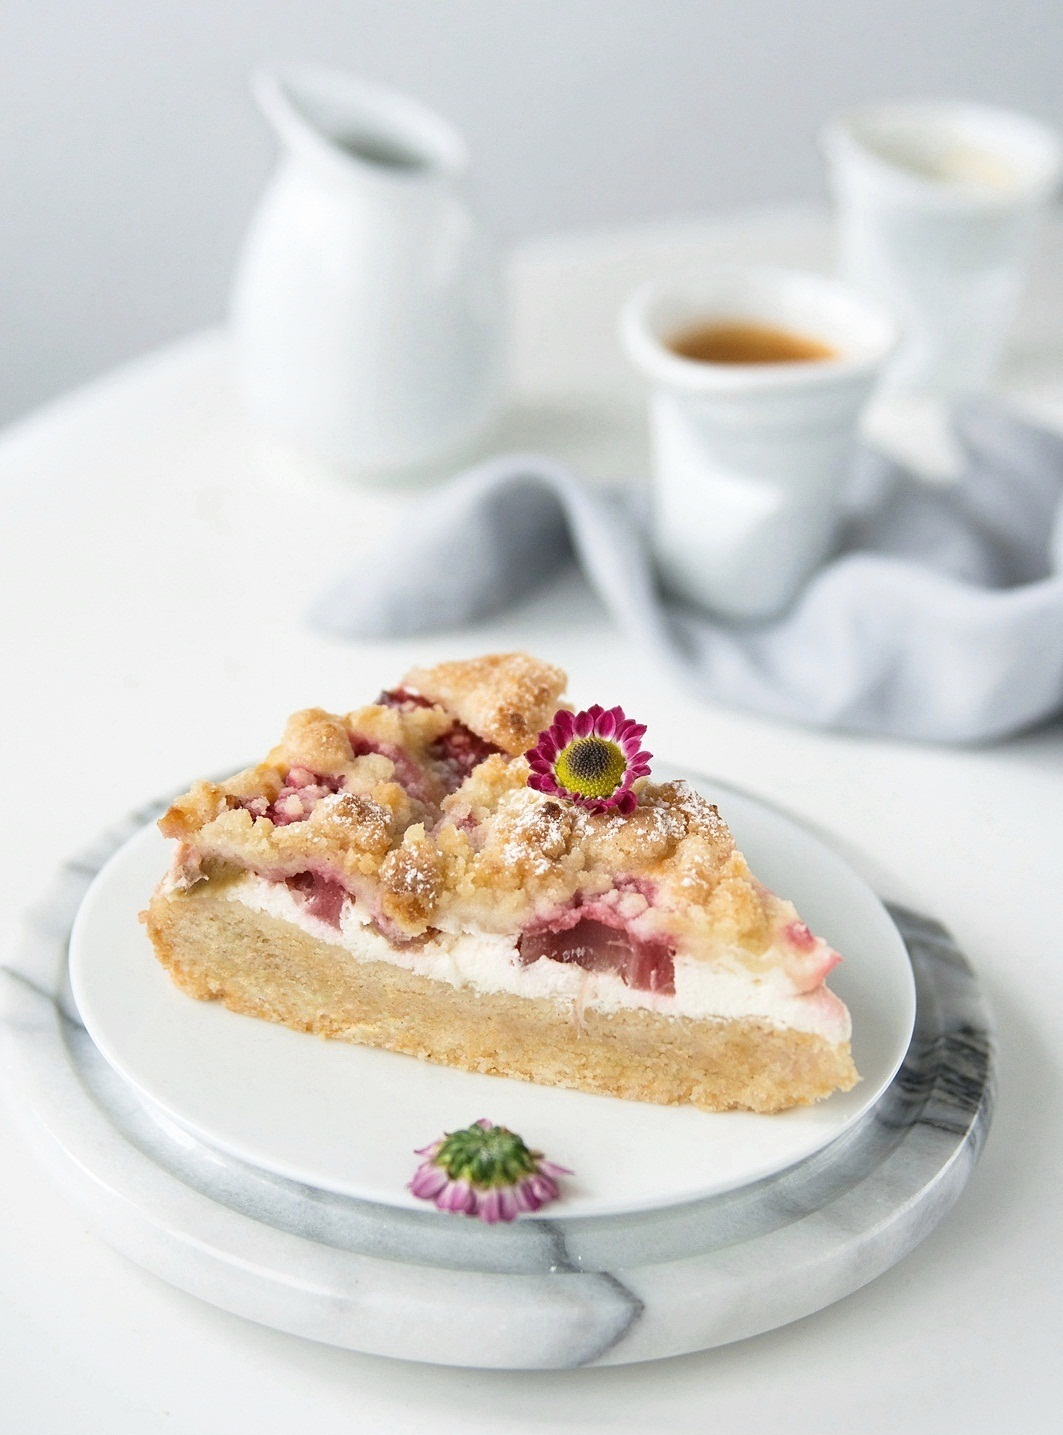 Frühlingsrezept: Rhabarber Streuselkuchen